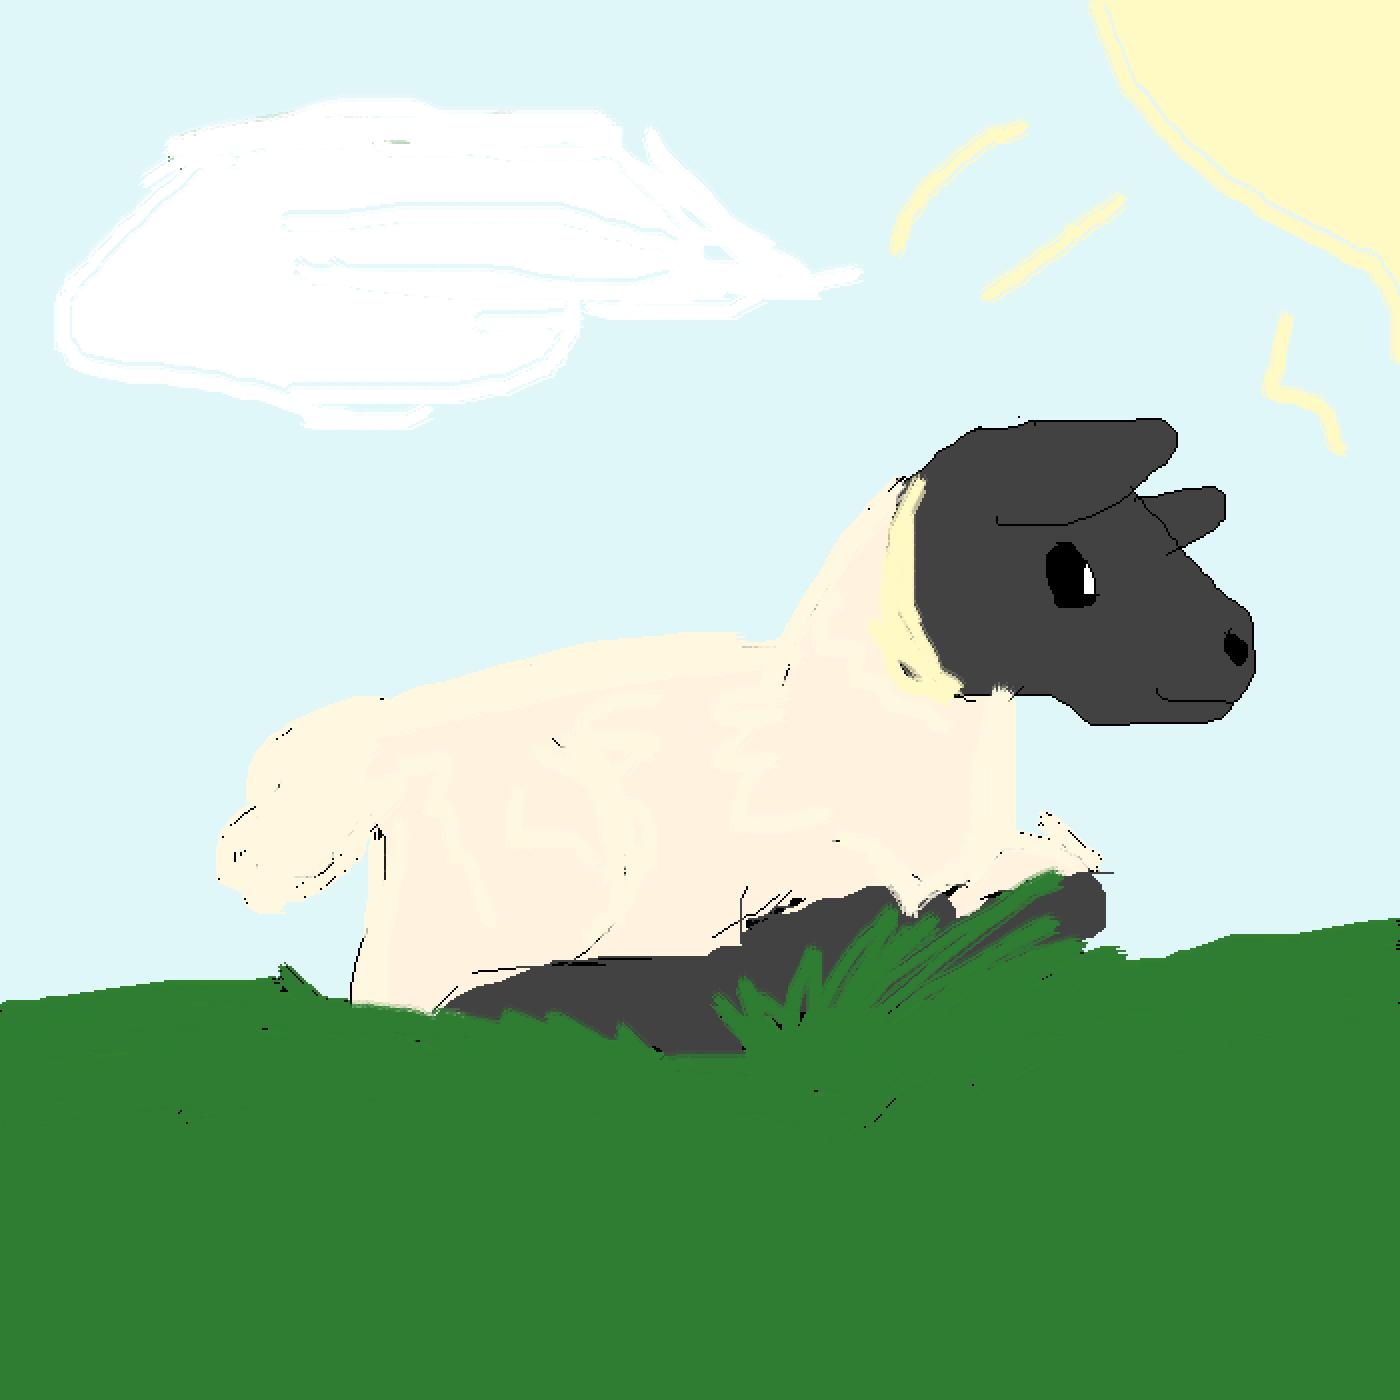 Easter sheep by Goatgirlgames